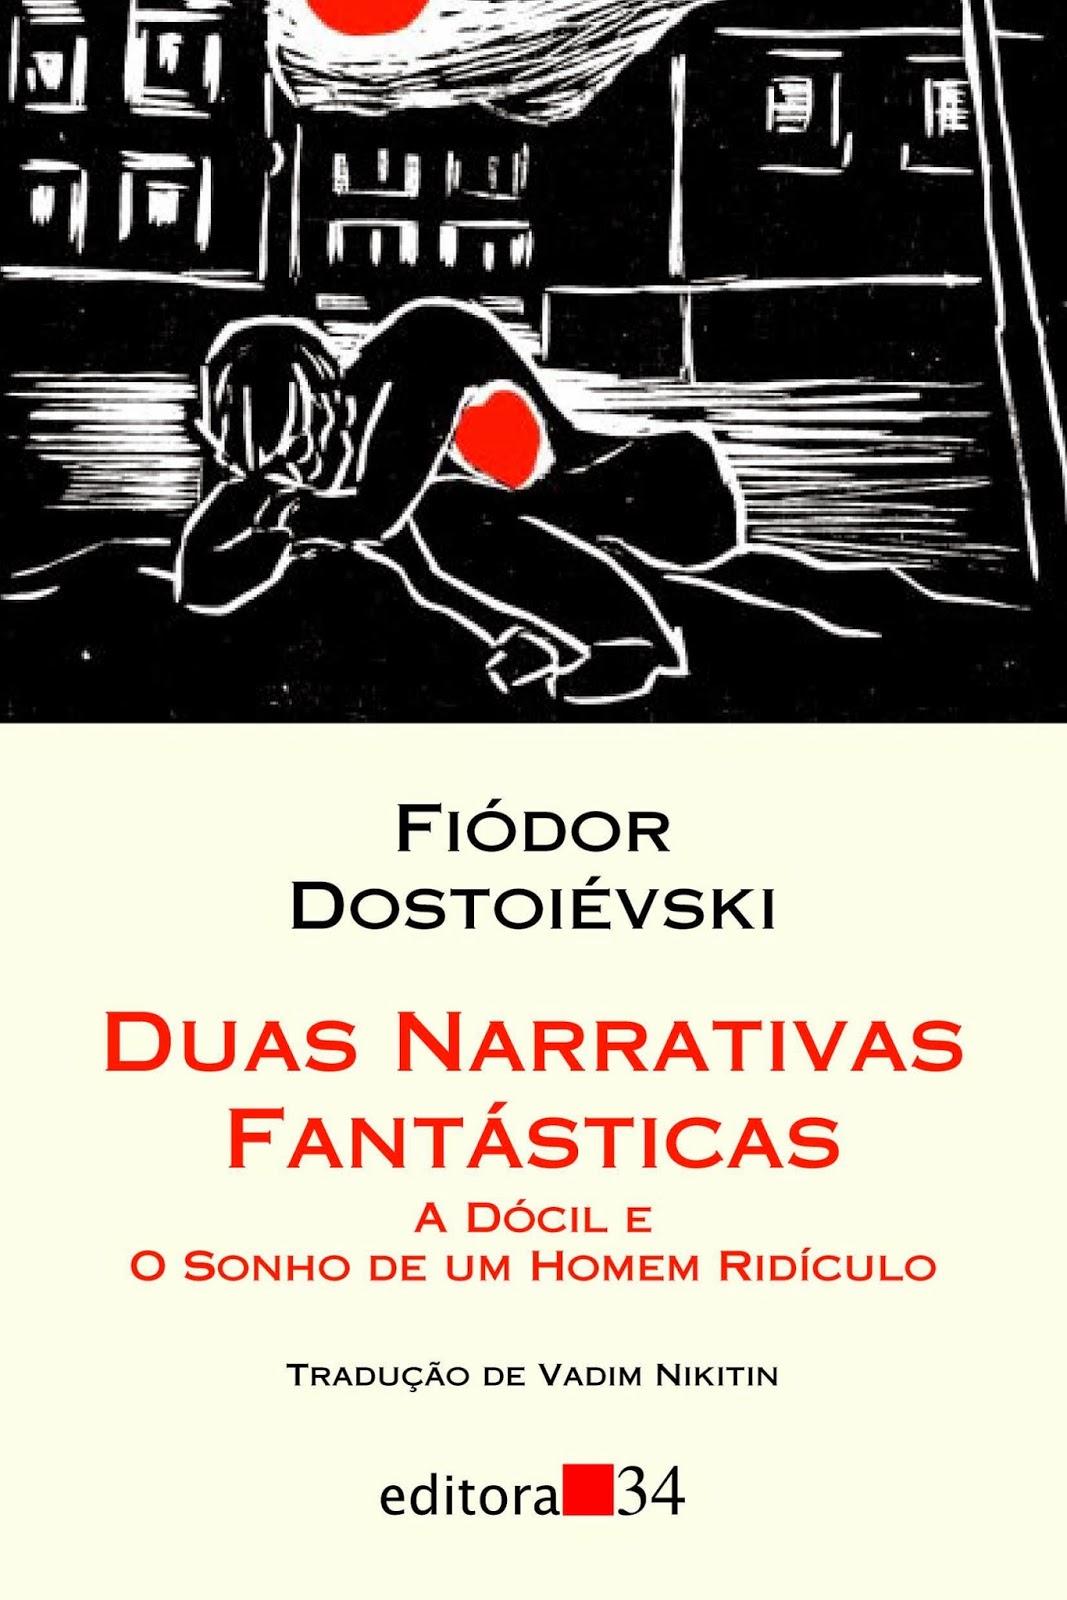 Fiódor Dostoiévski resenha